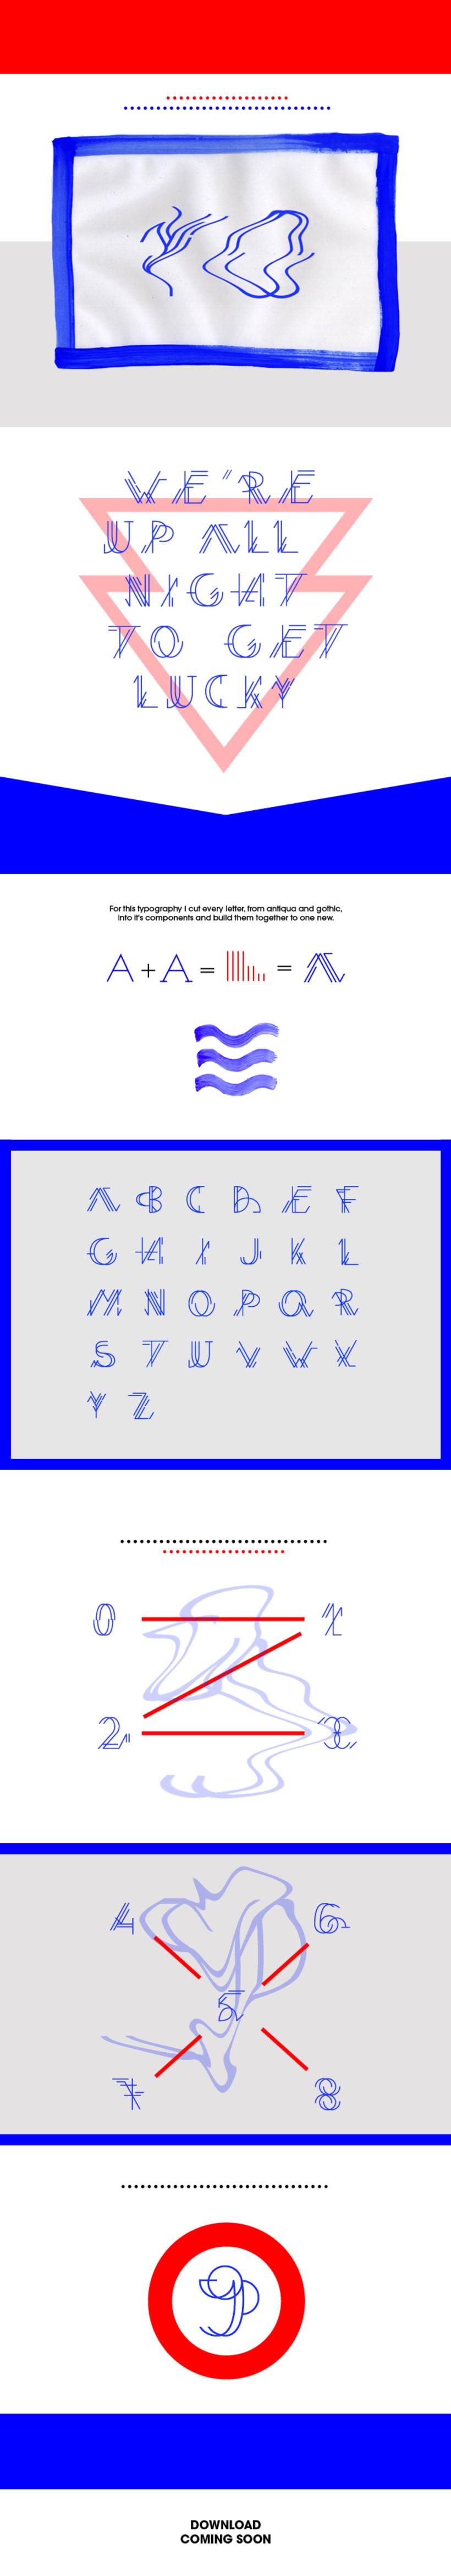 Typeface 0